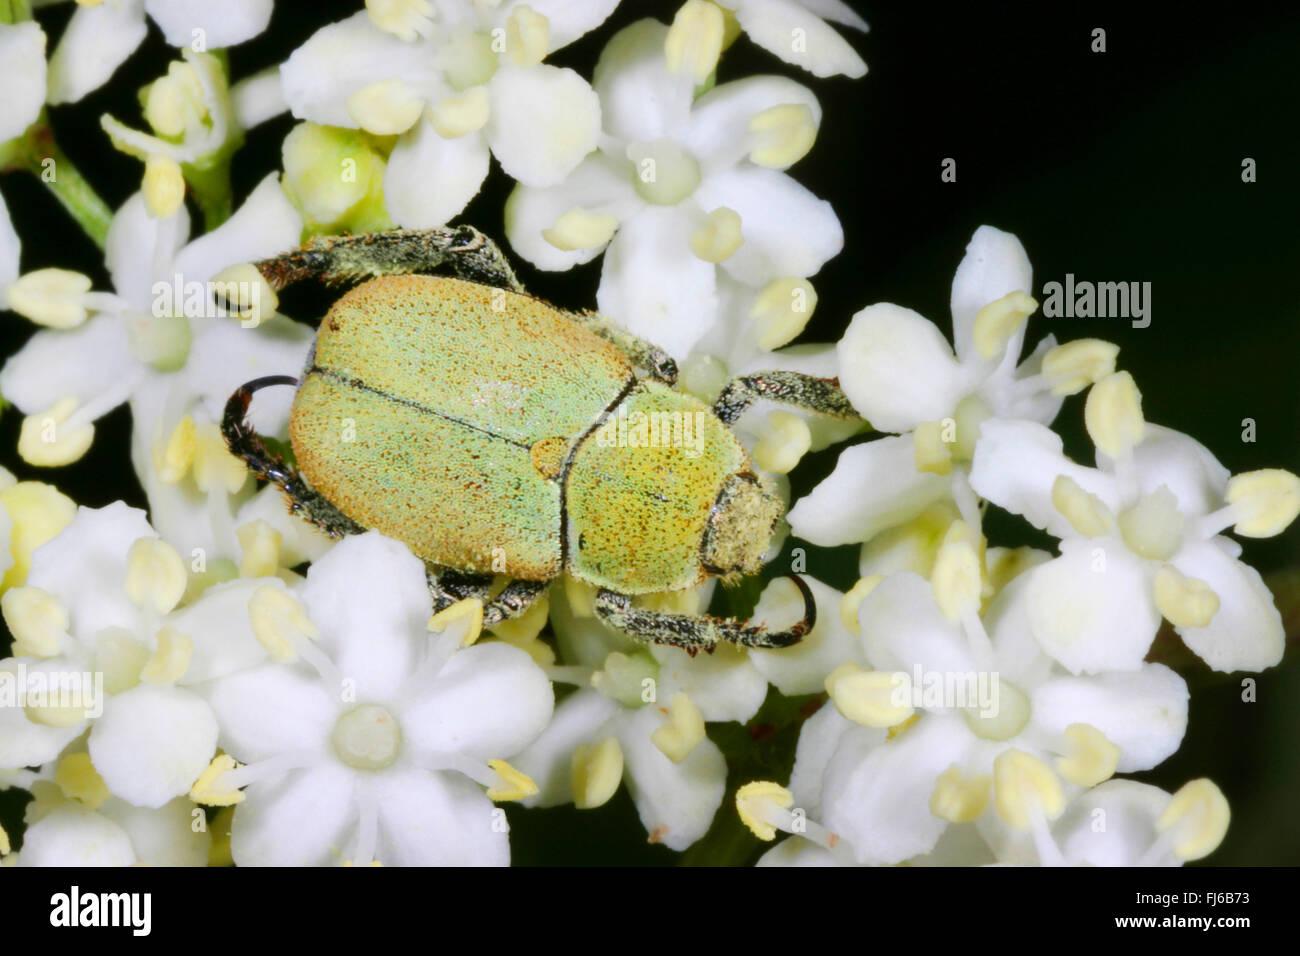 Scarab (Hoplia argentea, Hoplia farinosa), sitting on an umbellifer, Germany Stock Photo